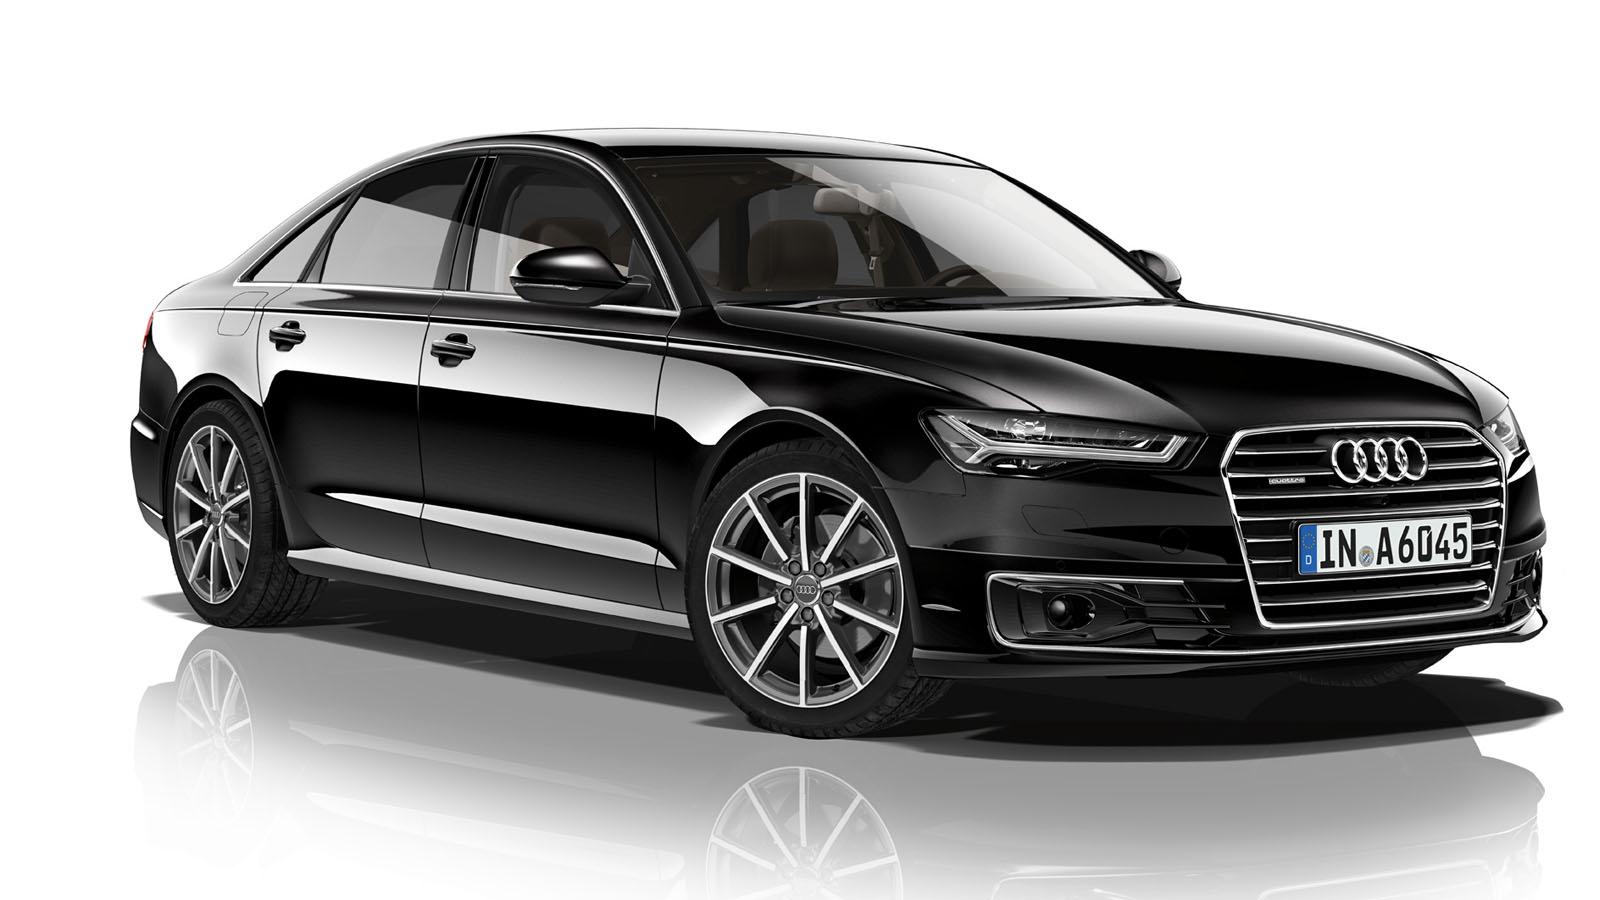 Audi A6, alquiler de coches con conductor Coexpress